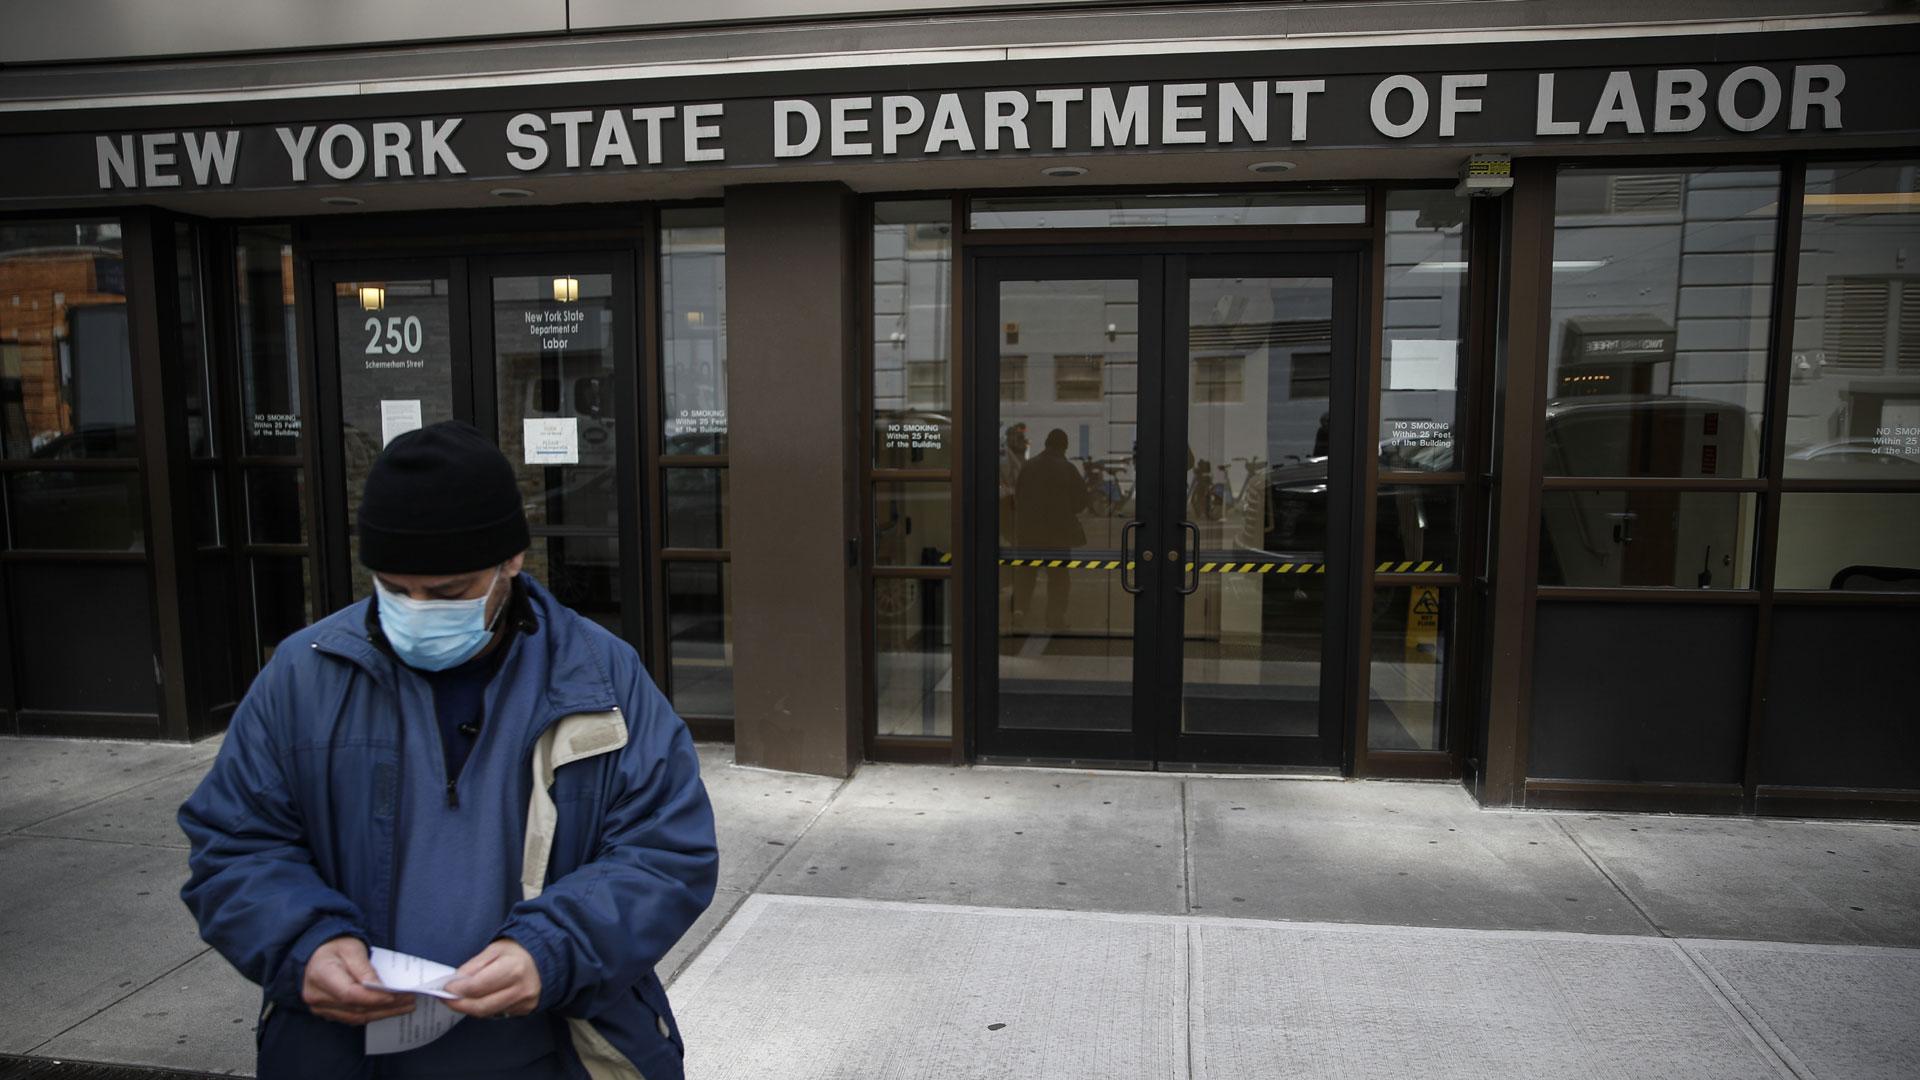 New York Labor Department